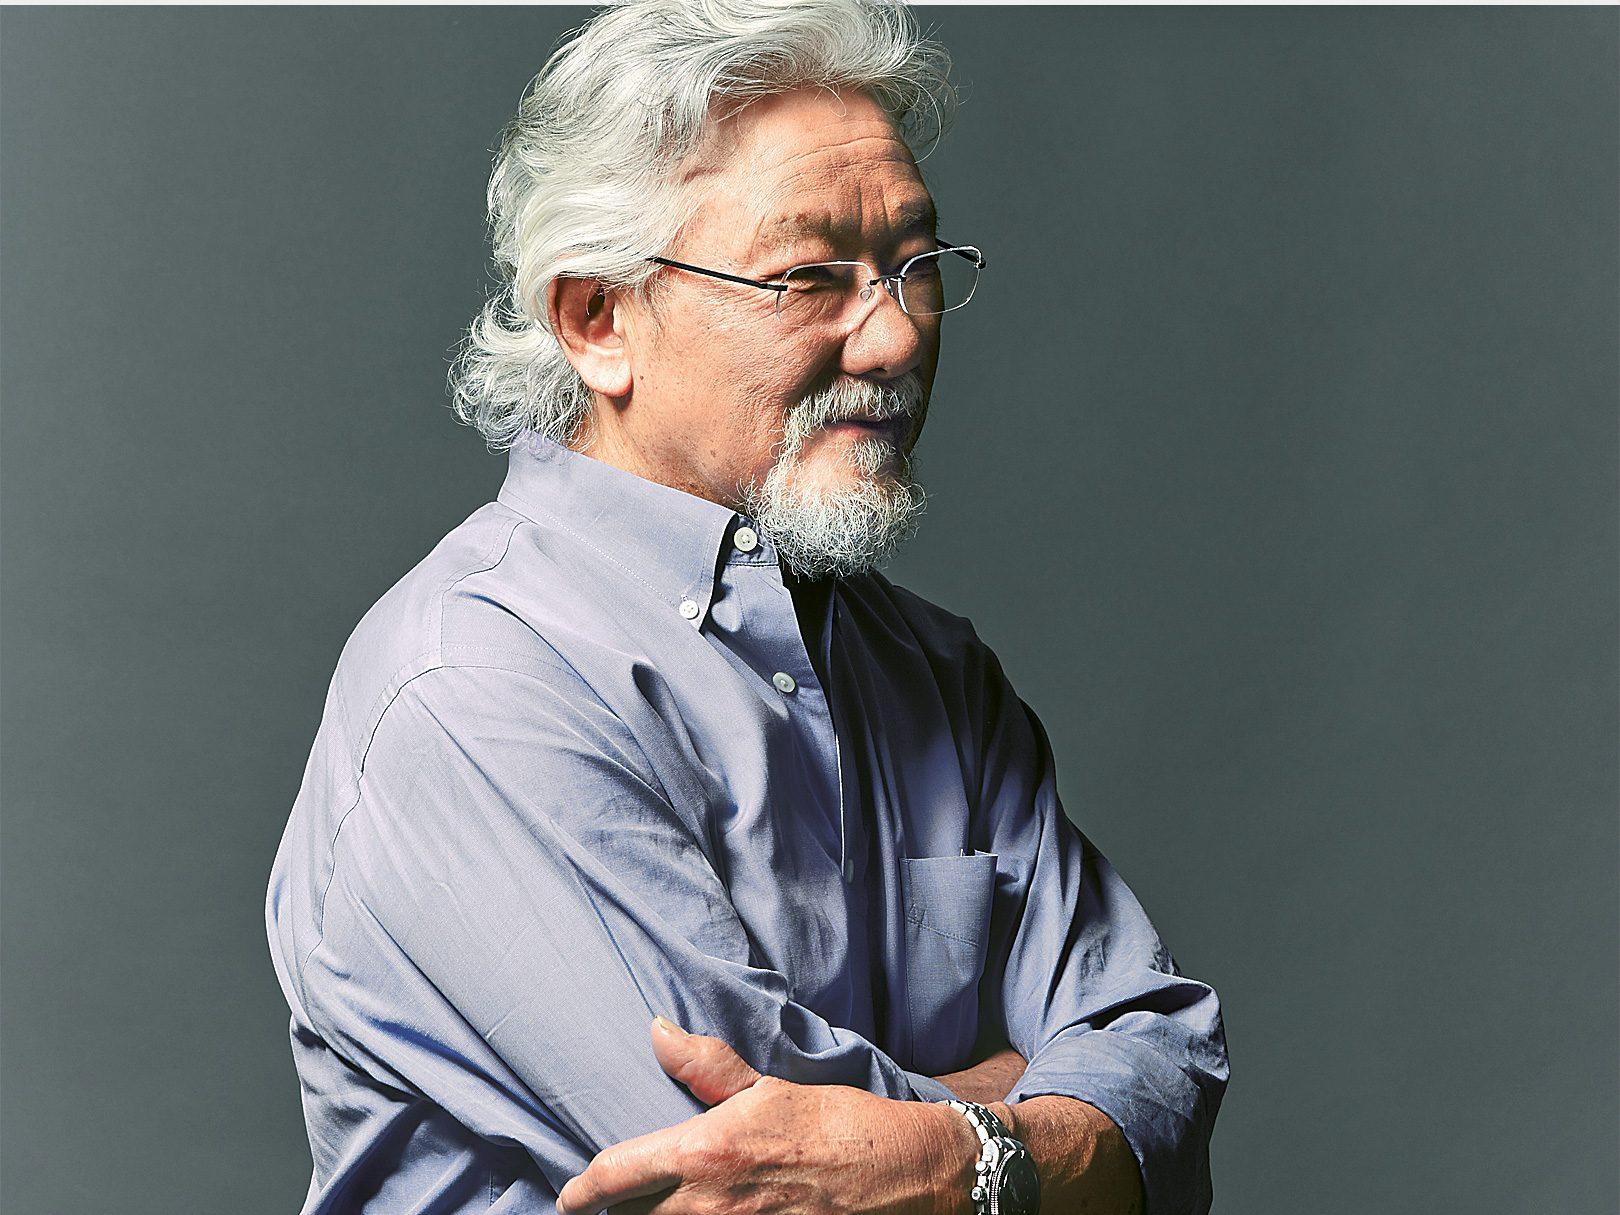 1. David Suzuki